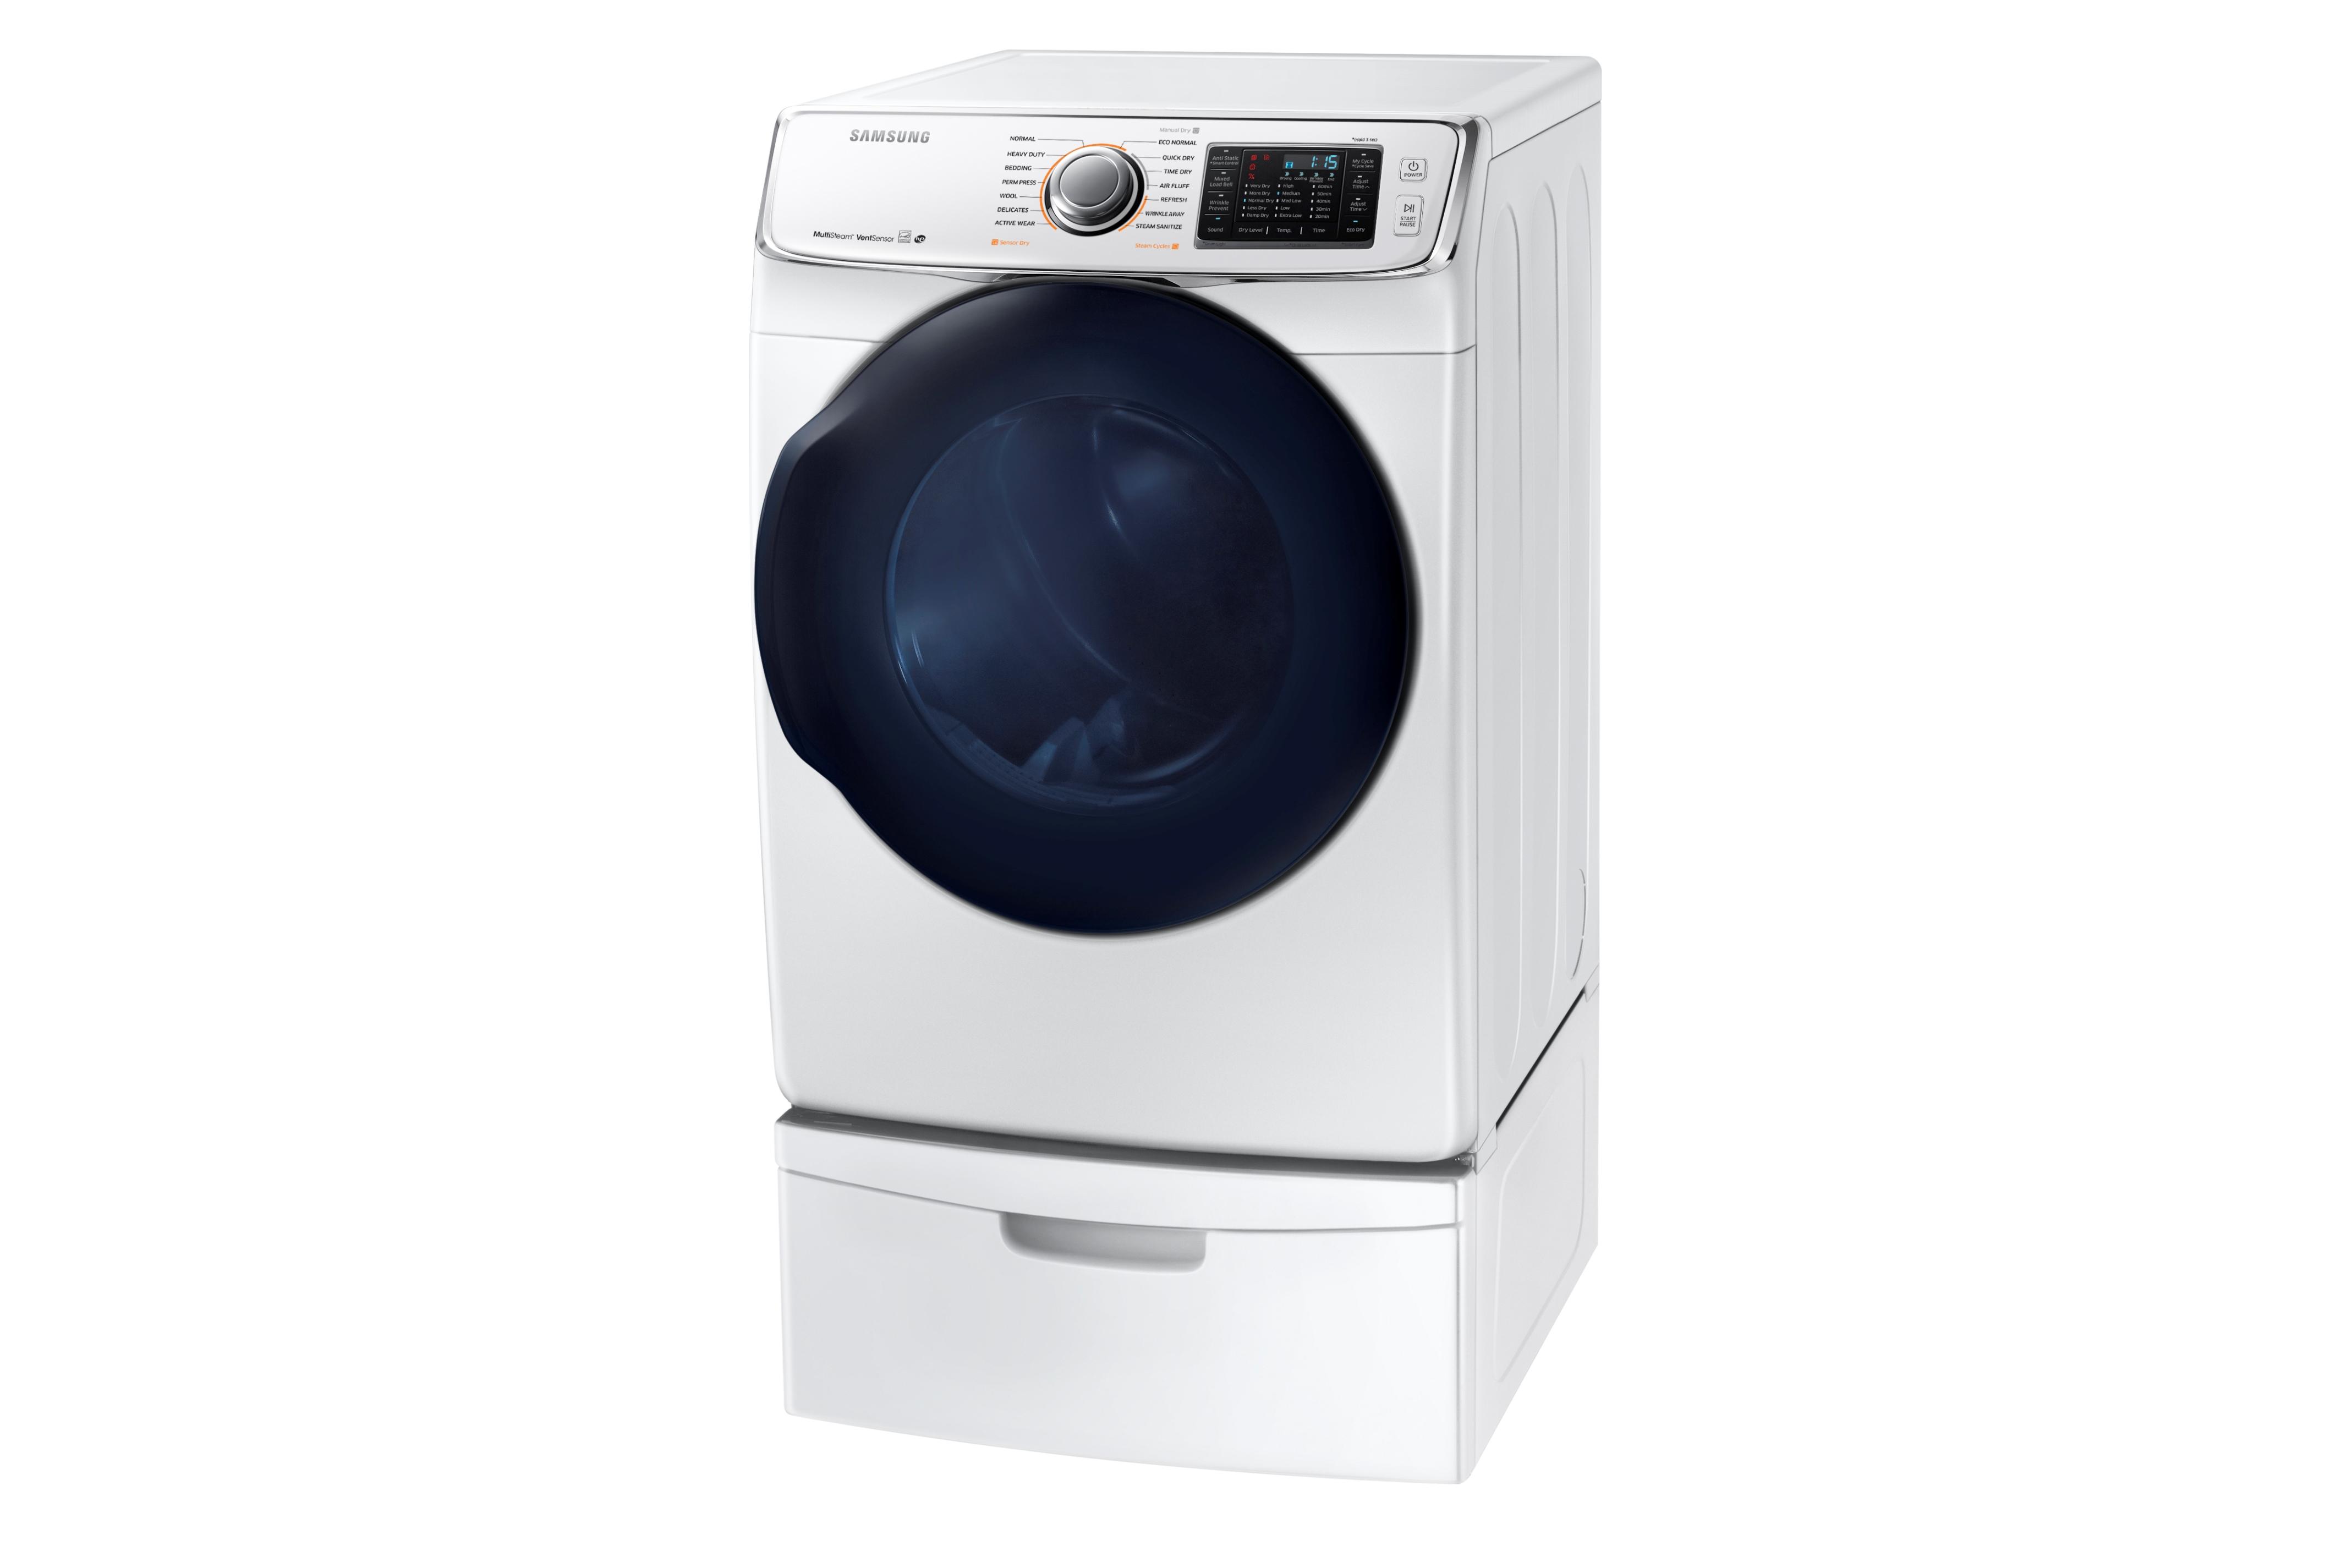 Samsung DV45K6500EW 7.5 cu. ft. Capacity Electric Dryer White